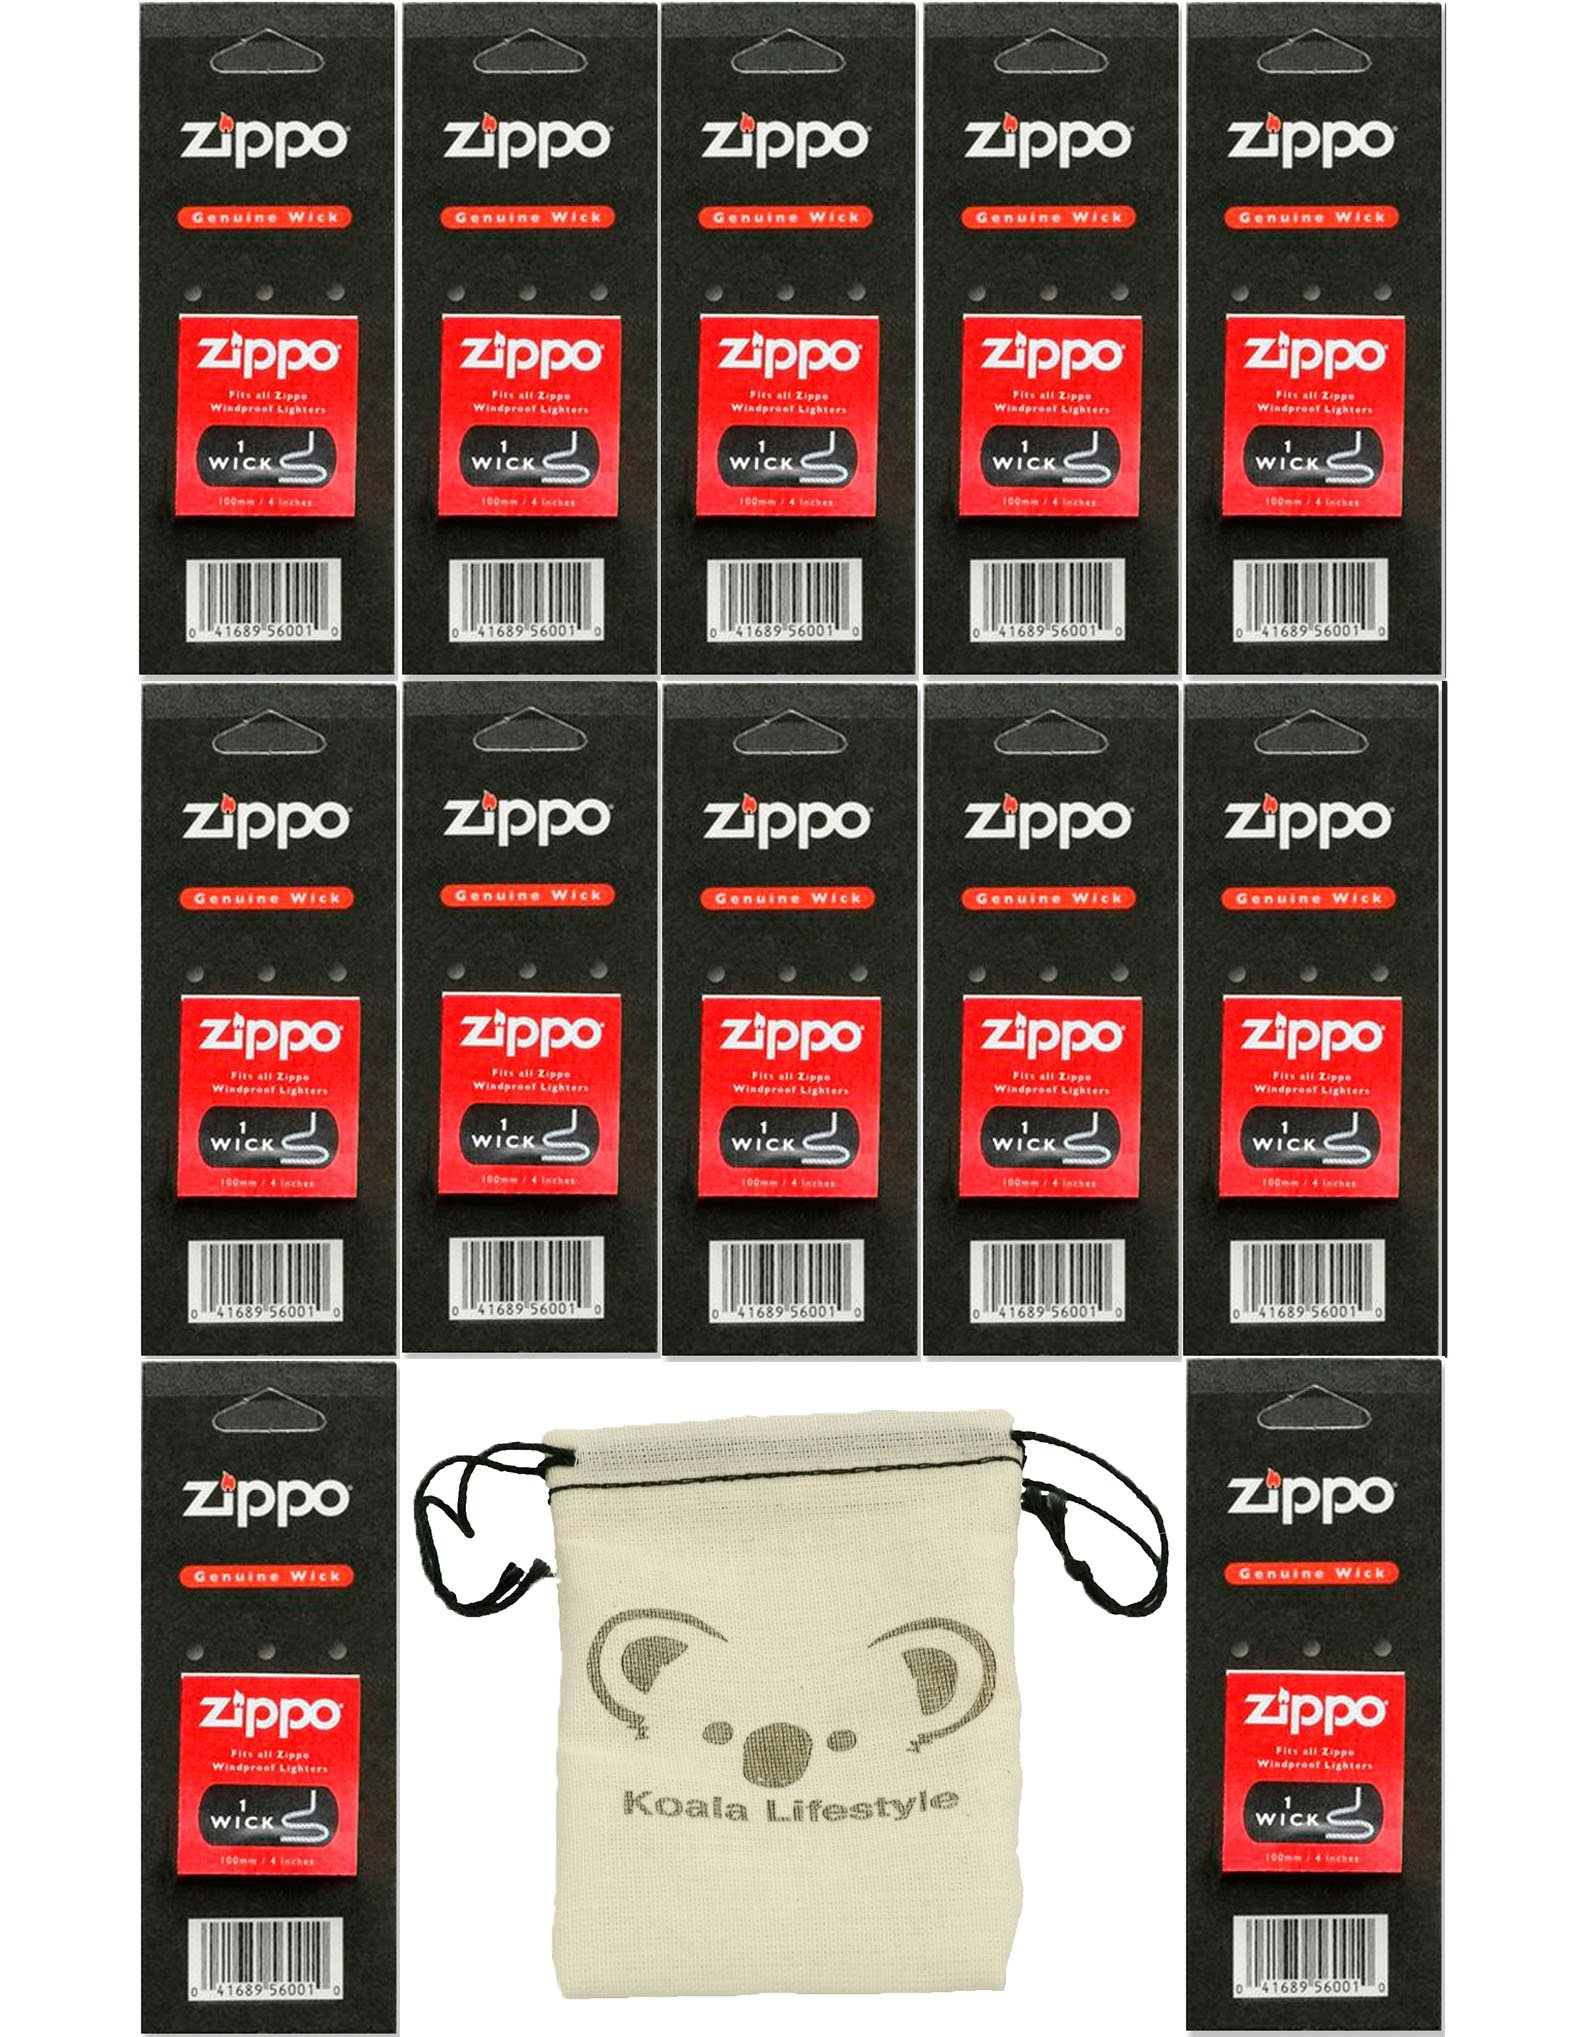 Zippo 12 Wicks Lighter Replacement Set Pack | 12pk Bundle + Pouch